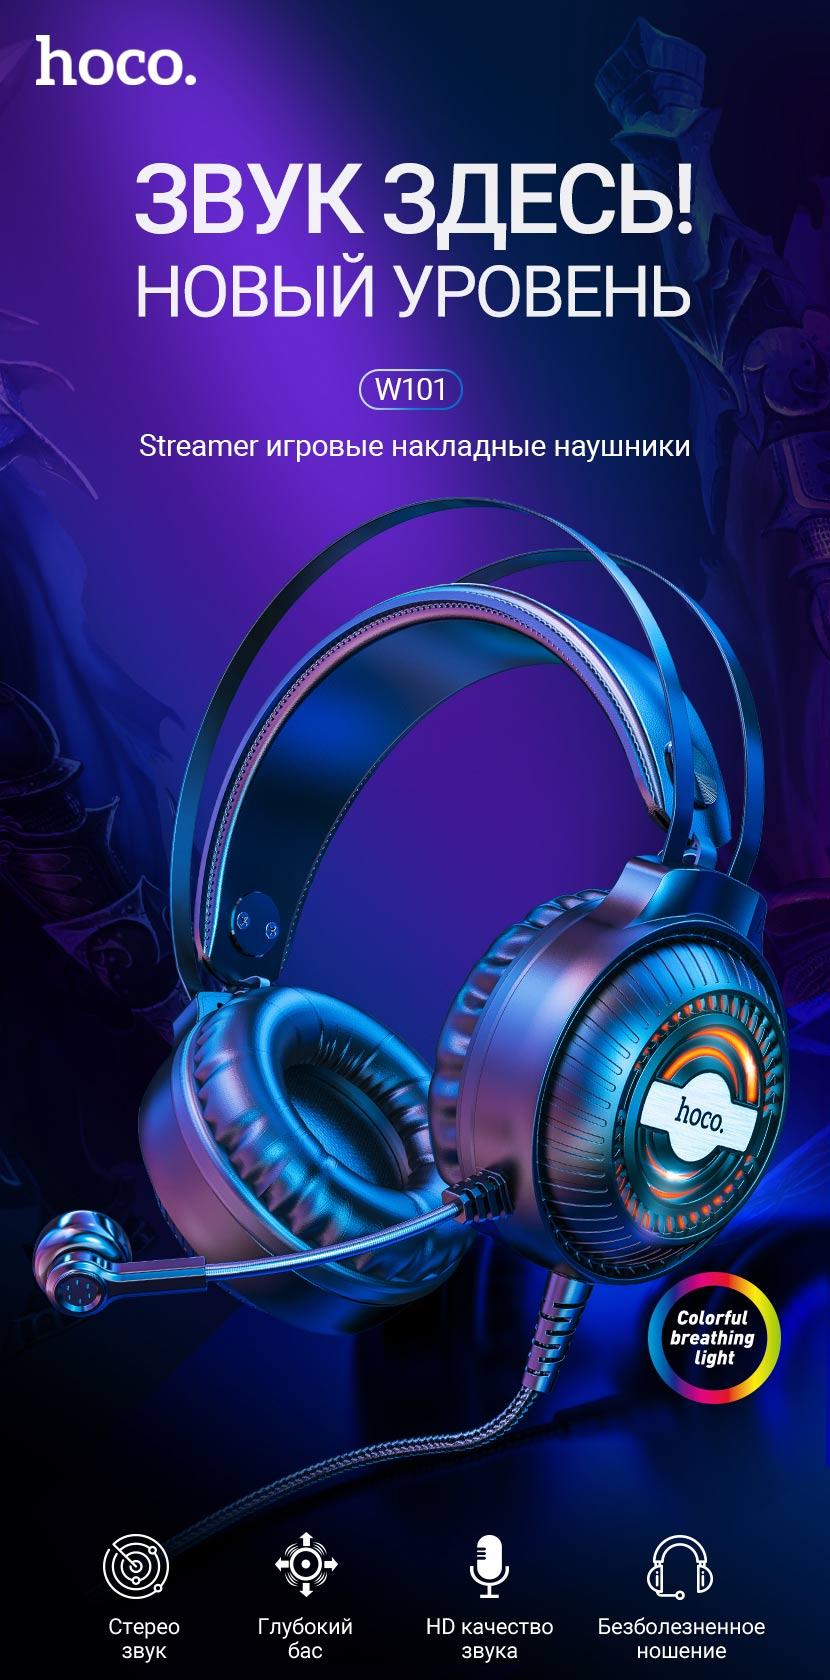 hoco news w101 streamer gaming headphones ru